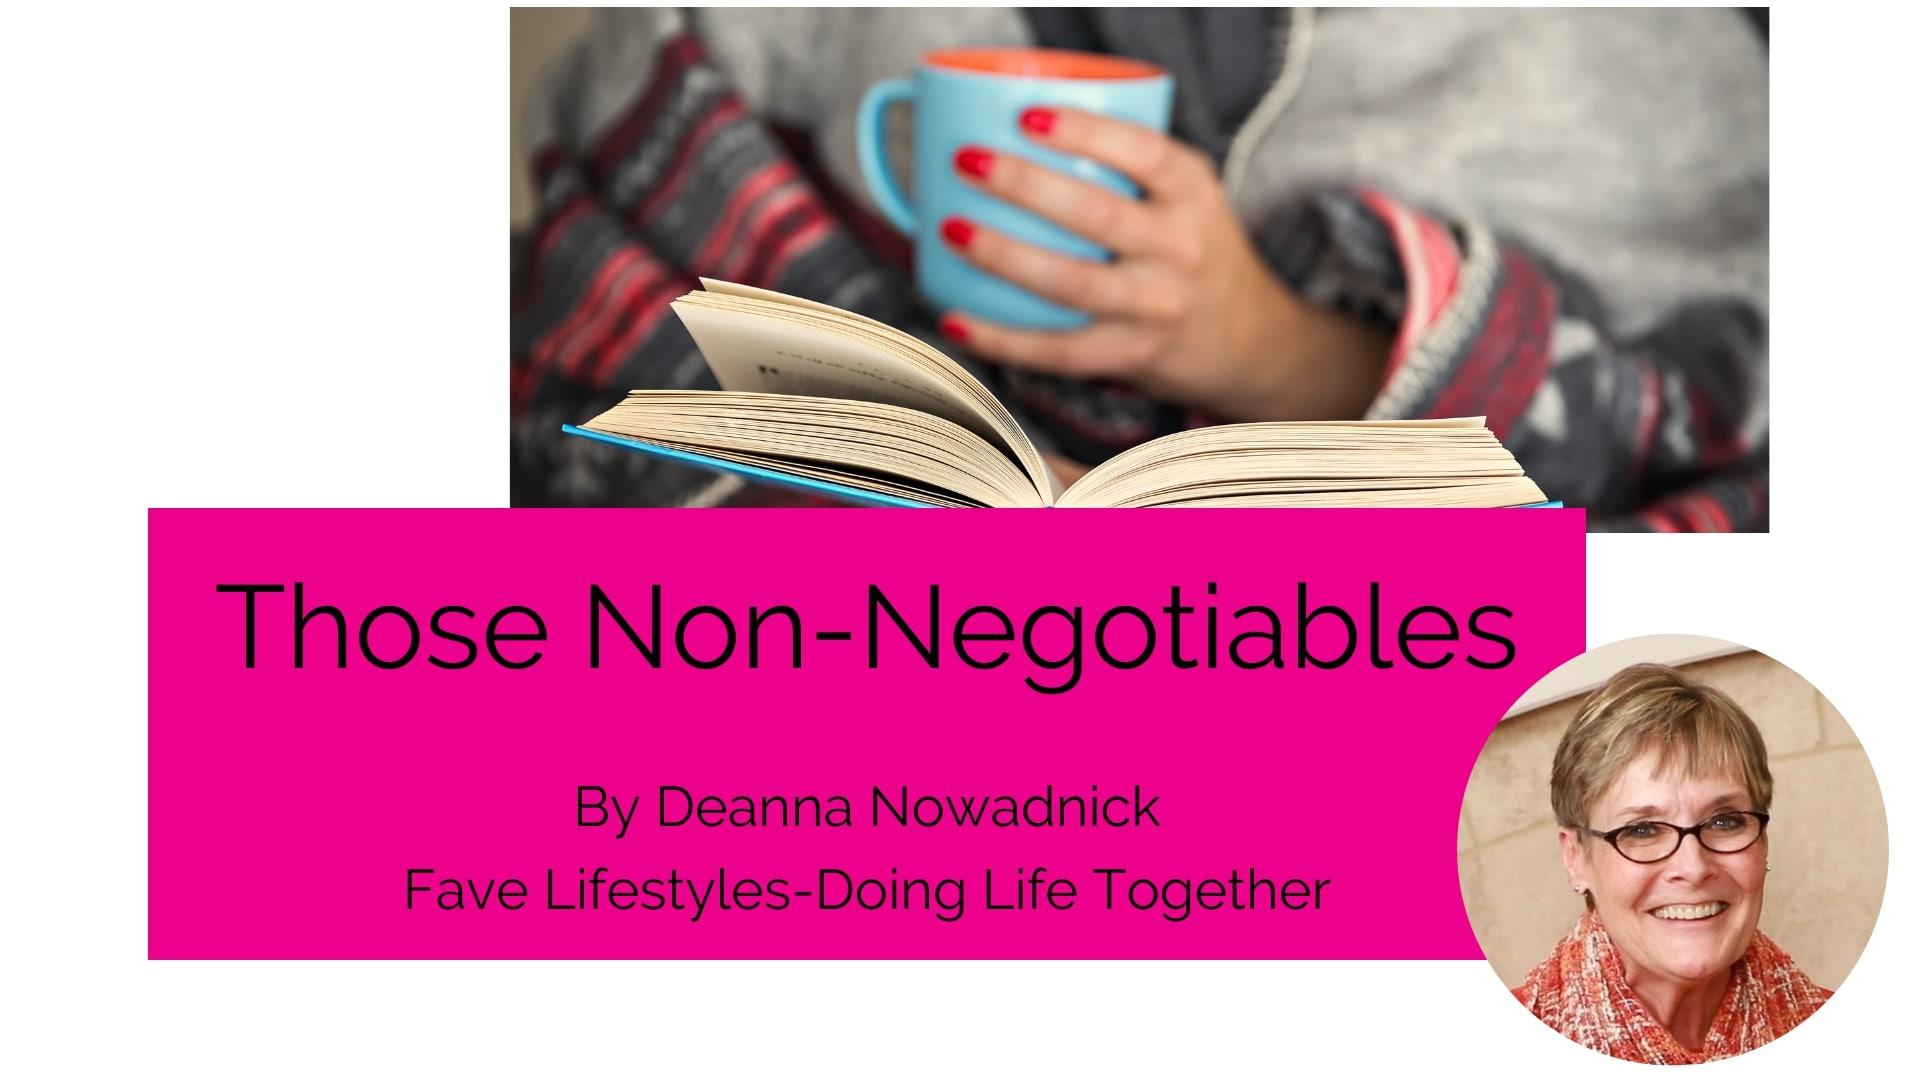 Those Non-Negotiables